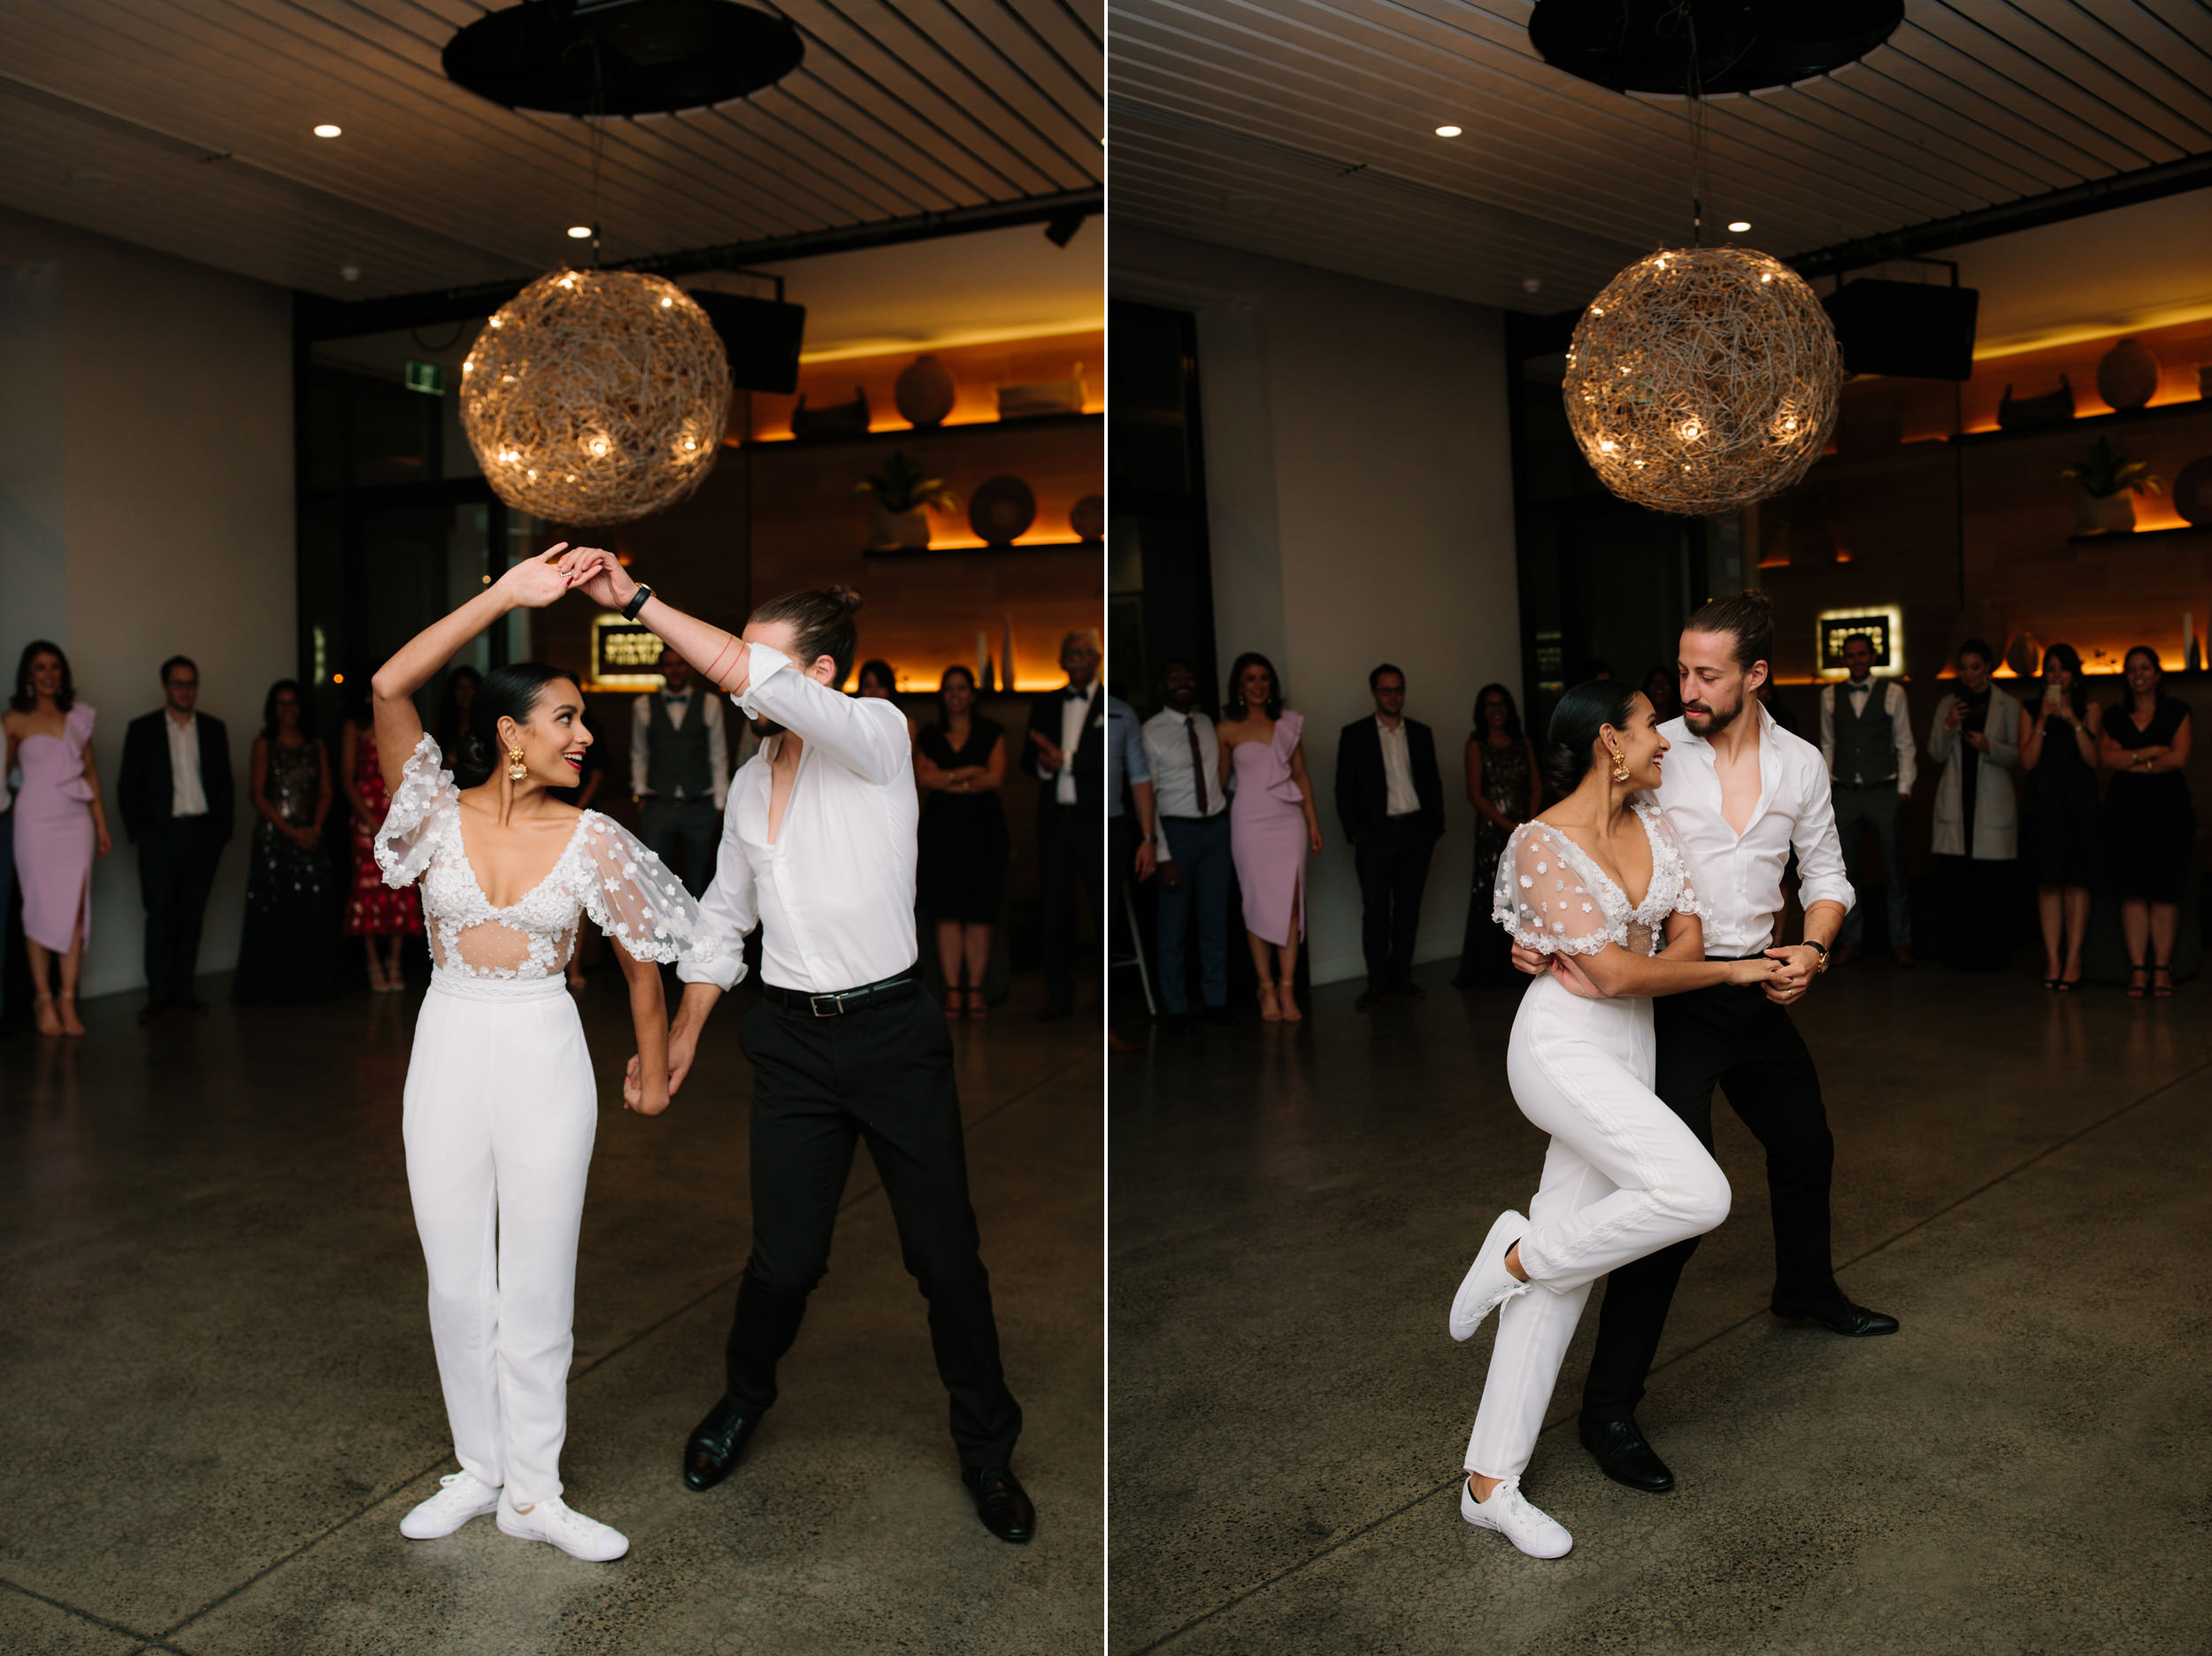 I-Got-You-Babe-Weddings-Tevany-Adam0133.JPG